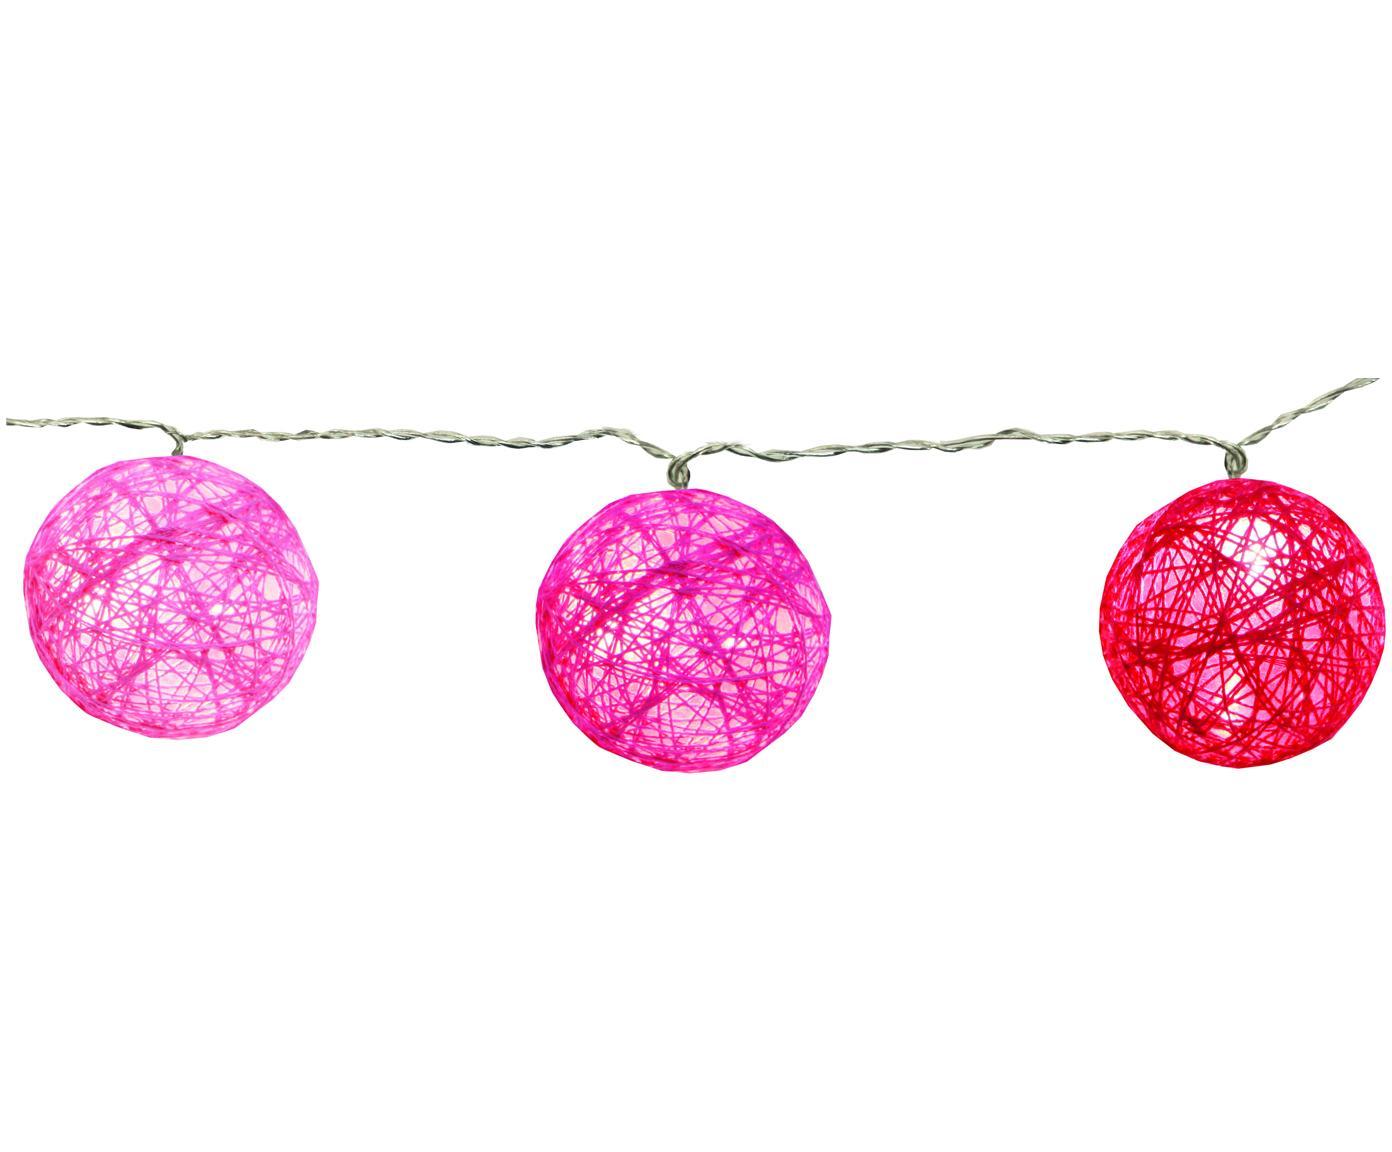 Guirnalda de luces LED Jolly Lights, 135cm, Linternas: algodón, Cable: plástico, Rosa, L 135 cm